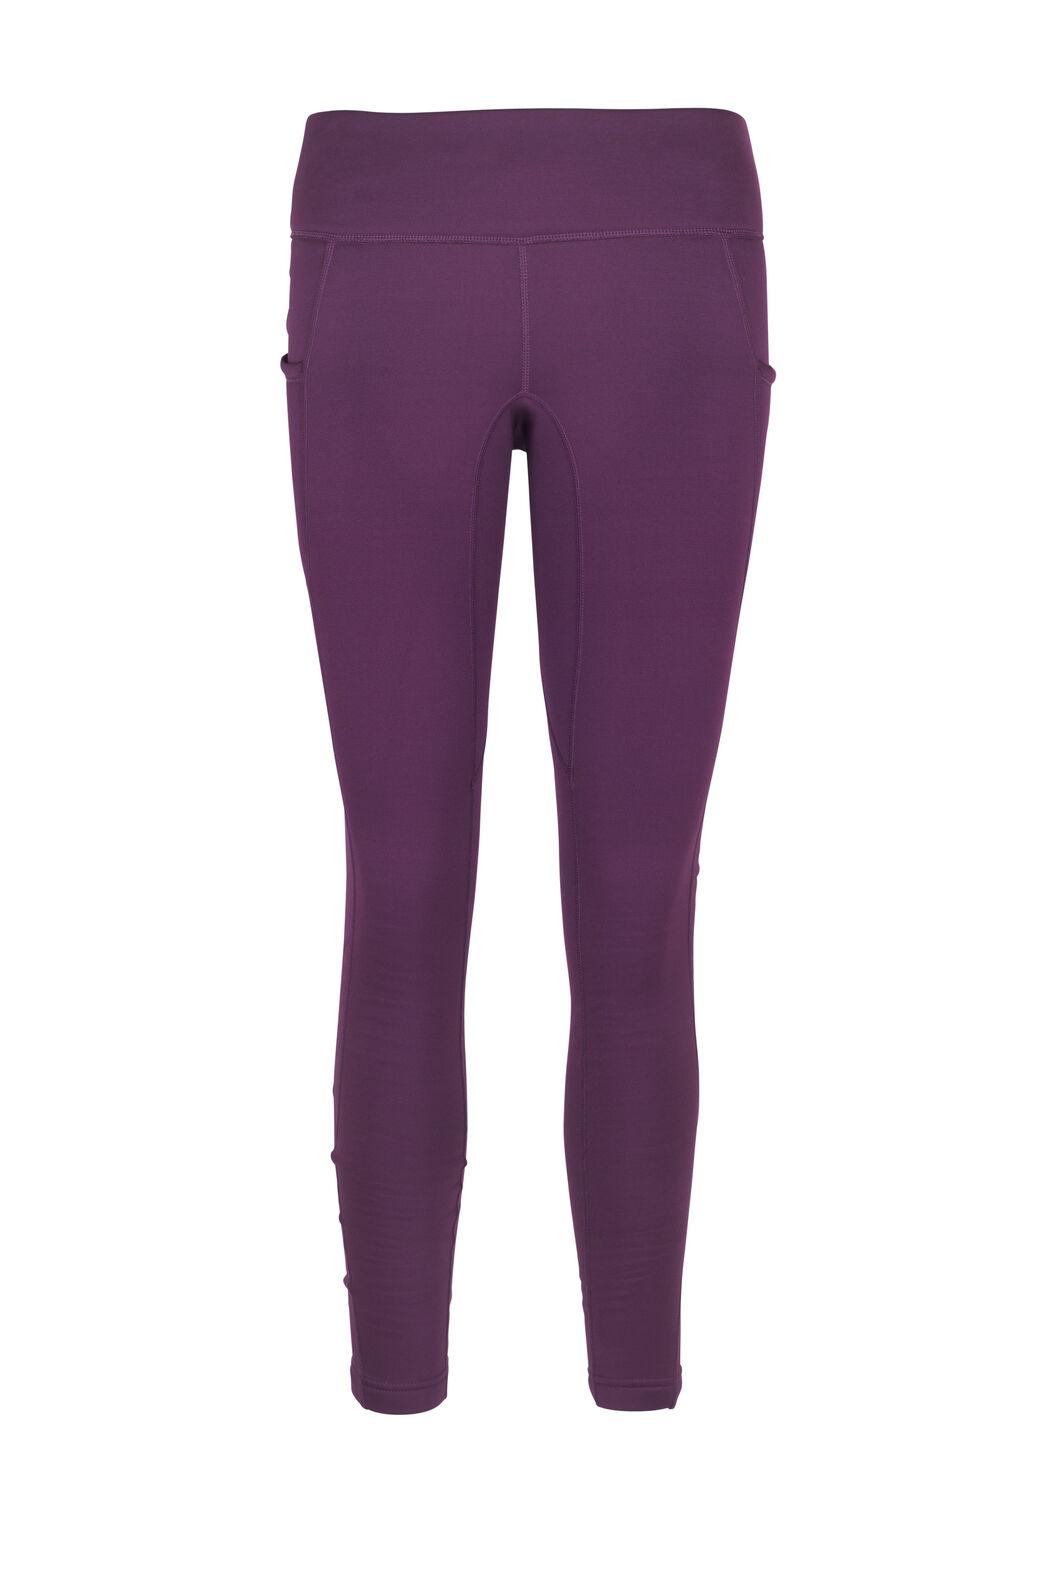 Macpac Traverse Tights - Women's, Potent Purple, hi-res